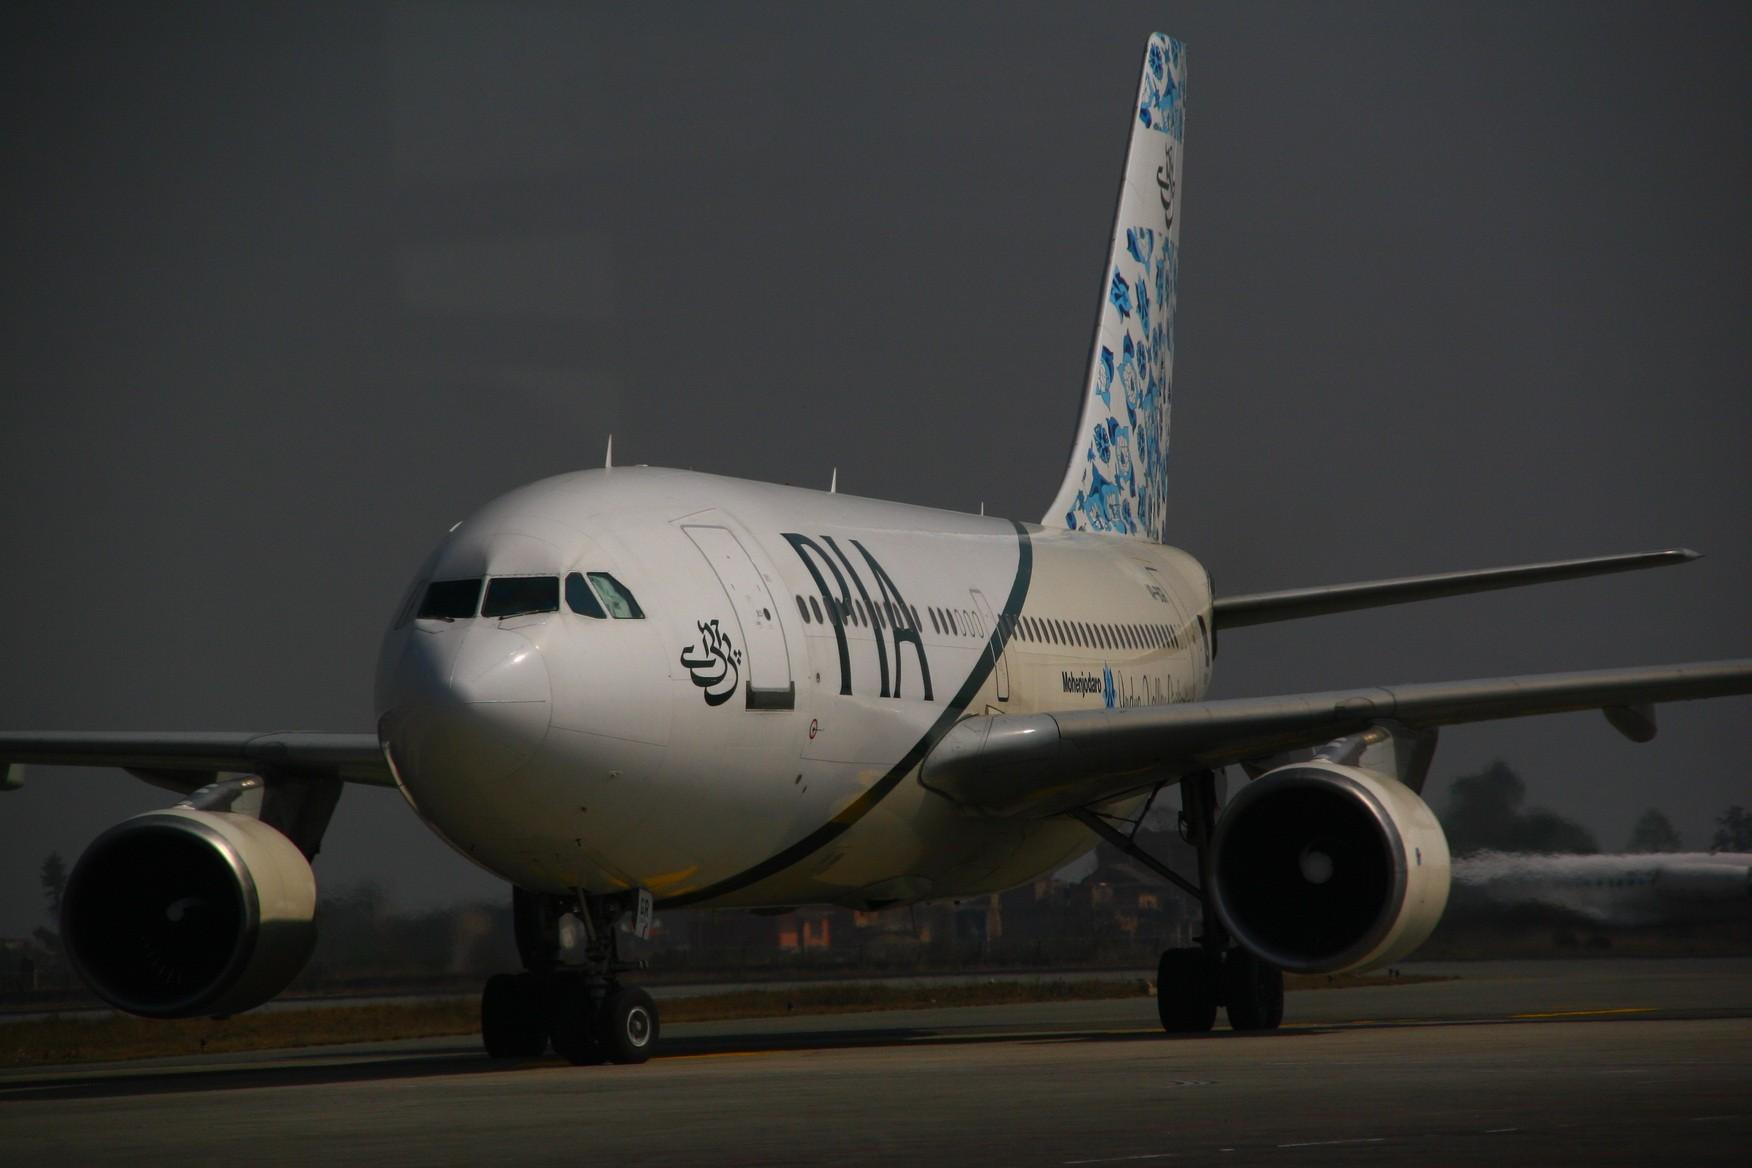 Re:[原创]游走尼泊尔,加德满都机场KTM与尼泊尔航空RA巡礼 AIRBUS A310  Nepal KATHMANDU trIBHUVAN